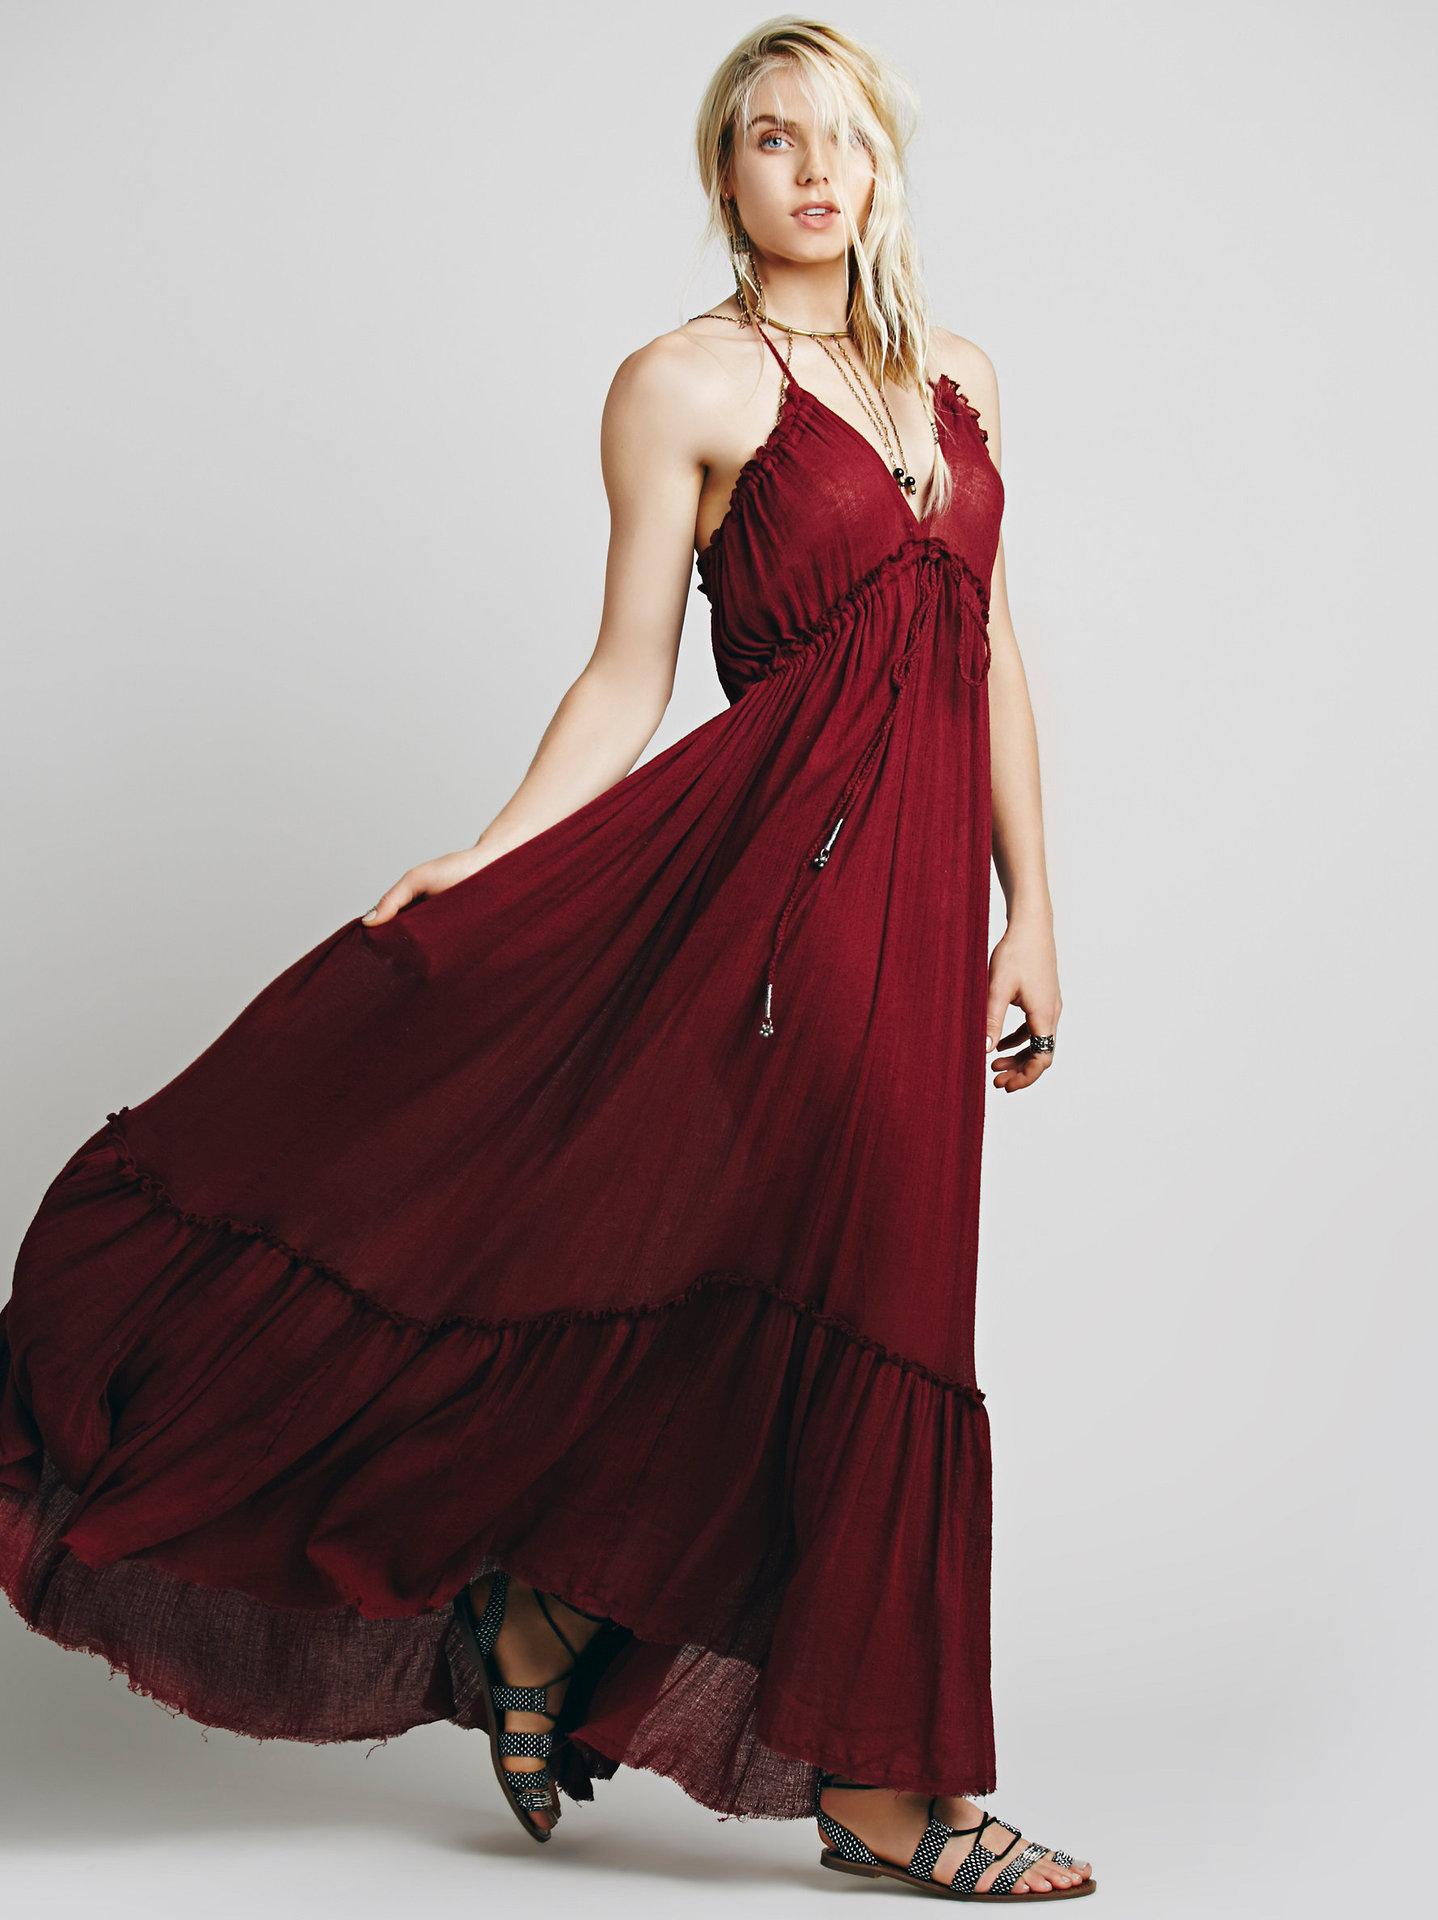 2016 Free Shipping Hot Greek Hobe Style Backless Dress